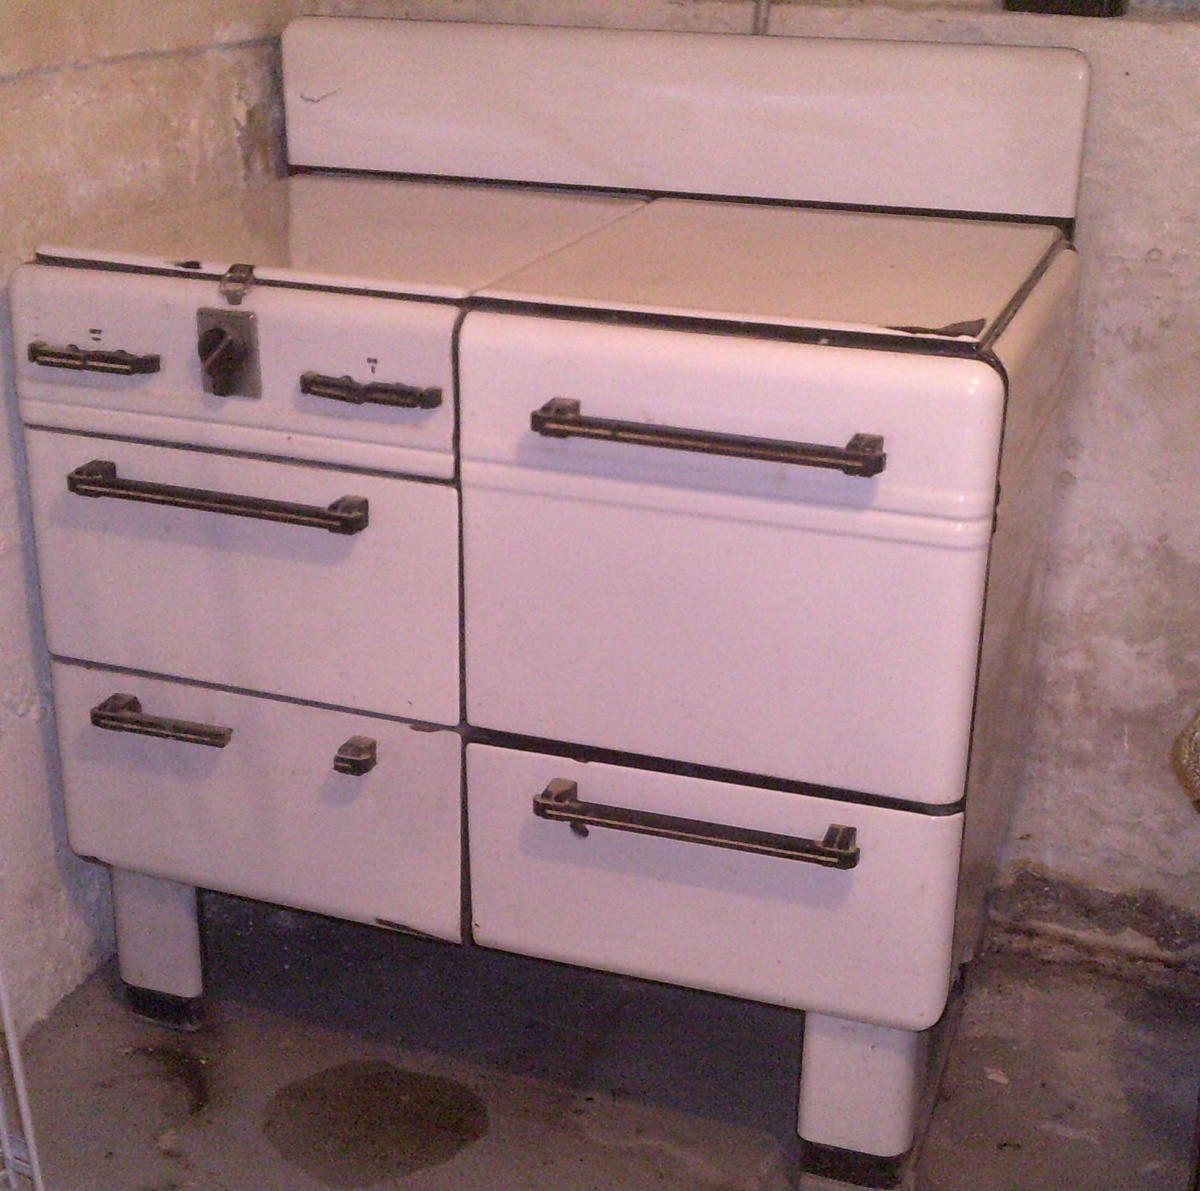 Sears, Roebuck and Co. Prosperity 4 burner gas range - Art Deco ...